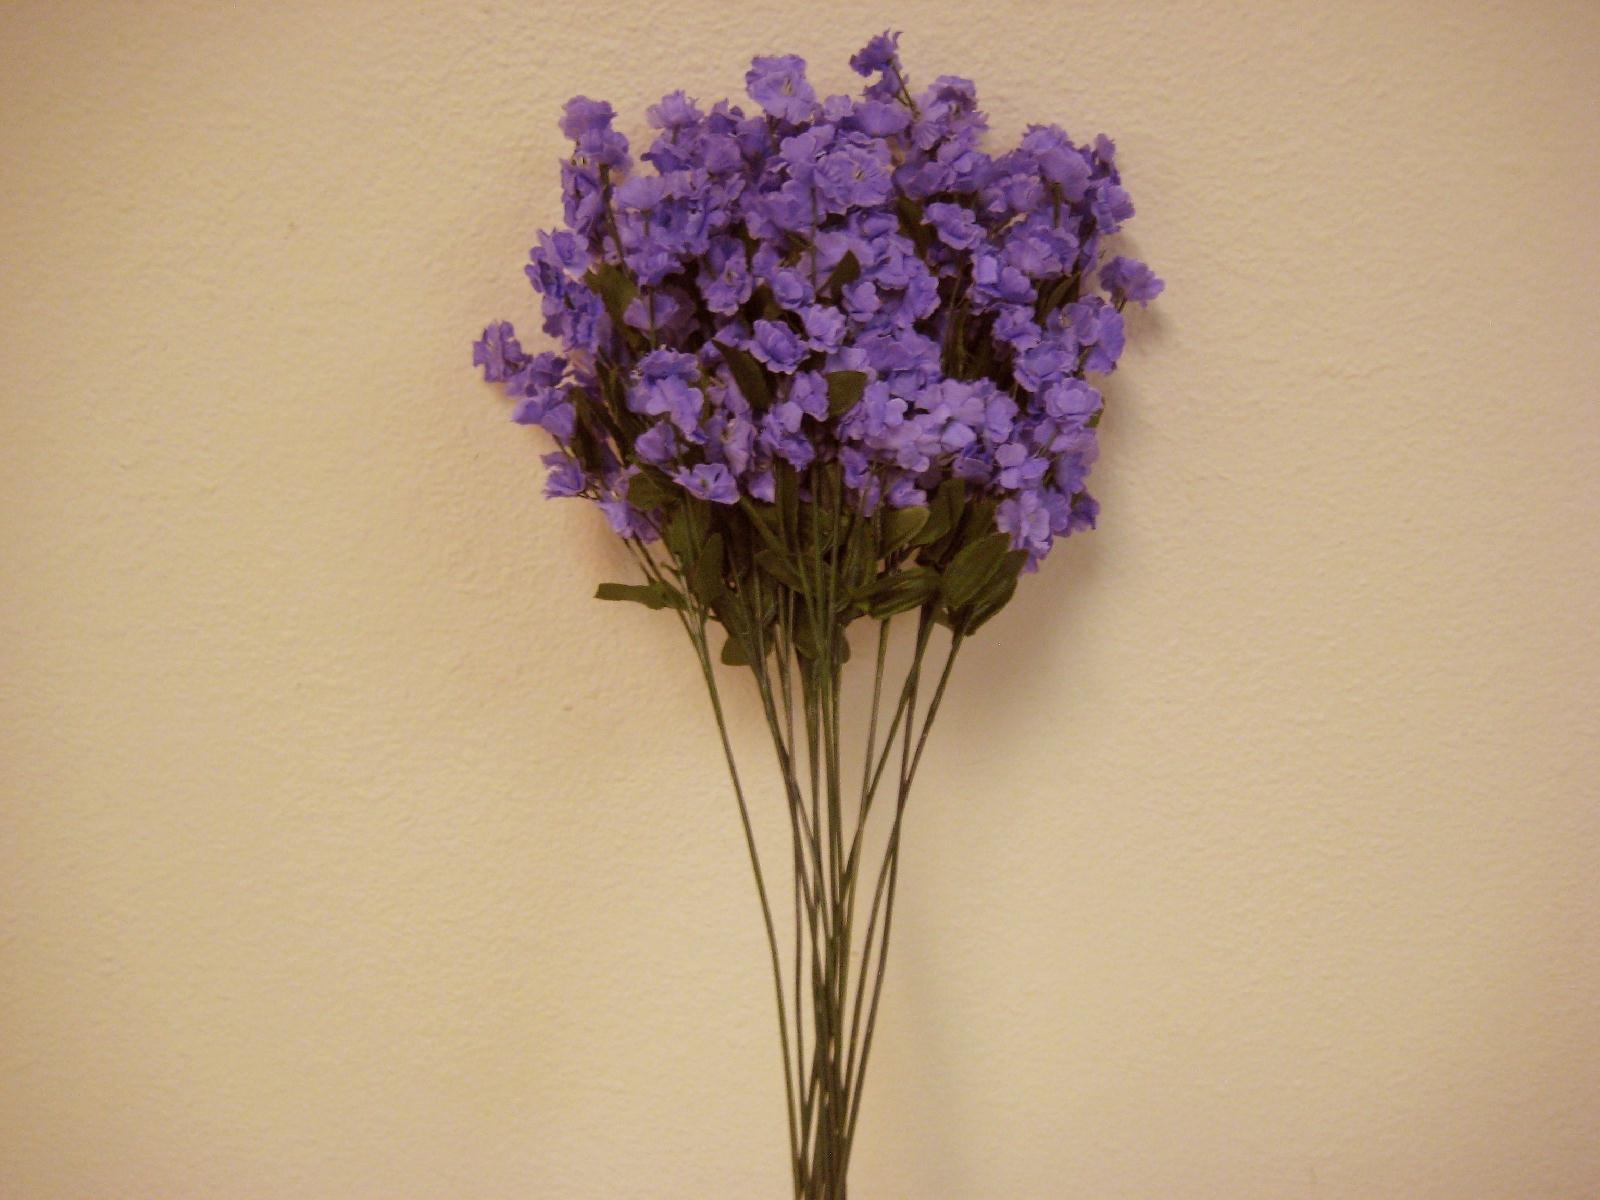 Phoenix-Silk-12-Sprays-LAVENDER-Ruffle-Baby-Breath-Filler-Artificial-Silk-Flowers-15-Stem-INT